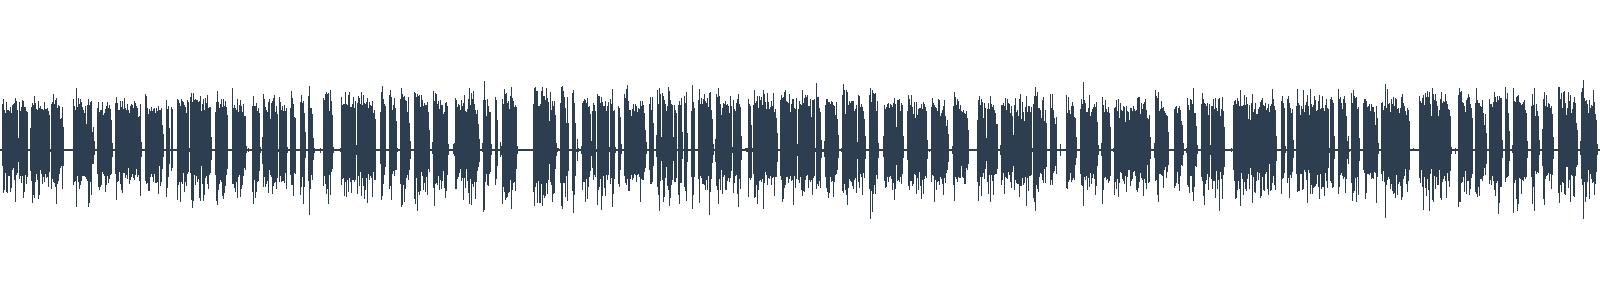 Adam Szustak: Hrniec strachu (3) waveform